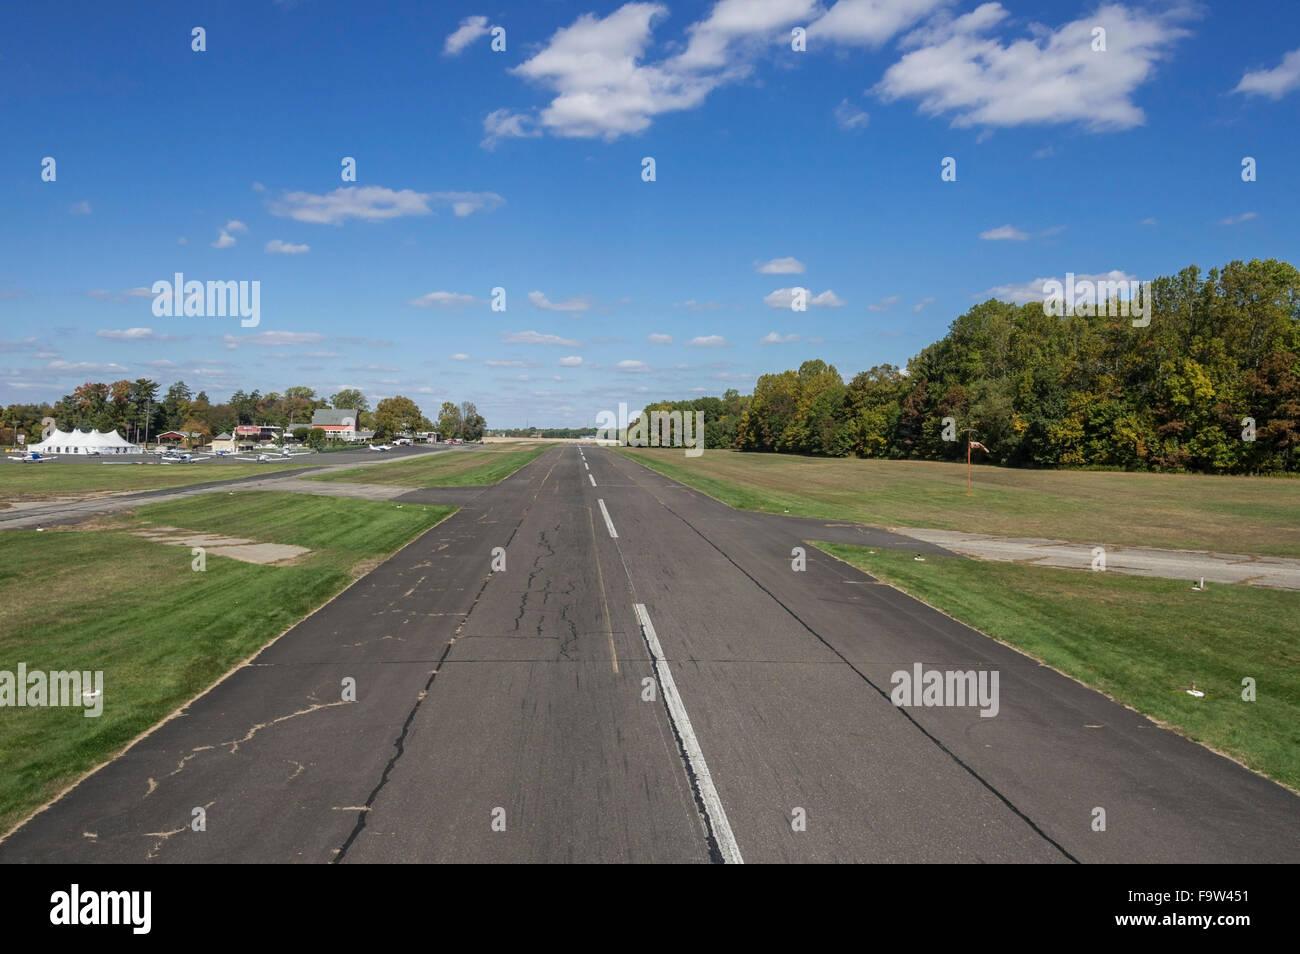 Small Regional Airport Runway - Stock Image